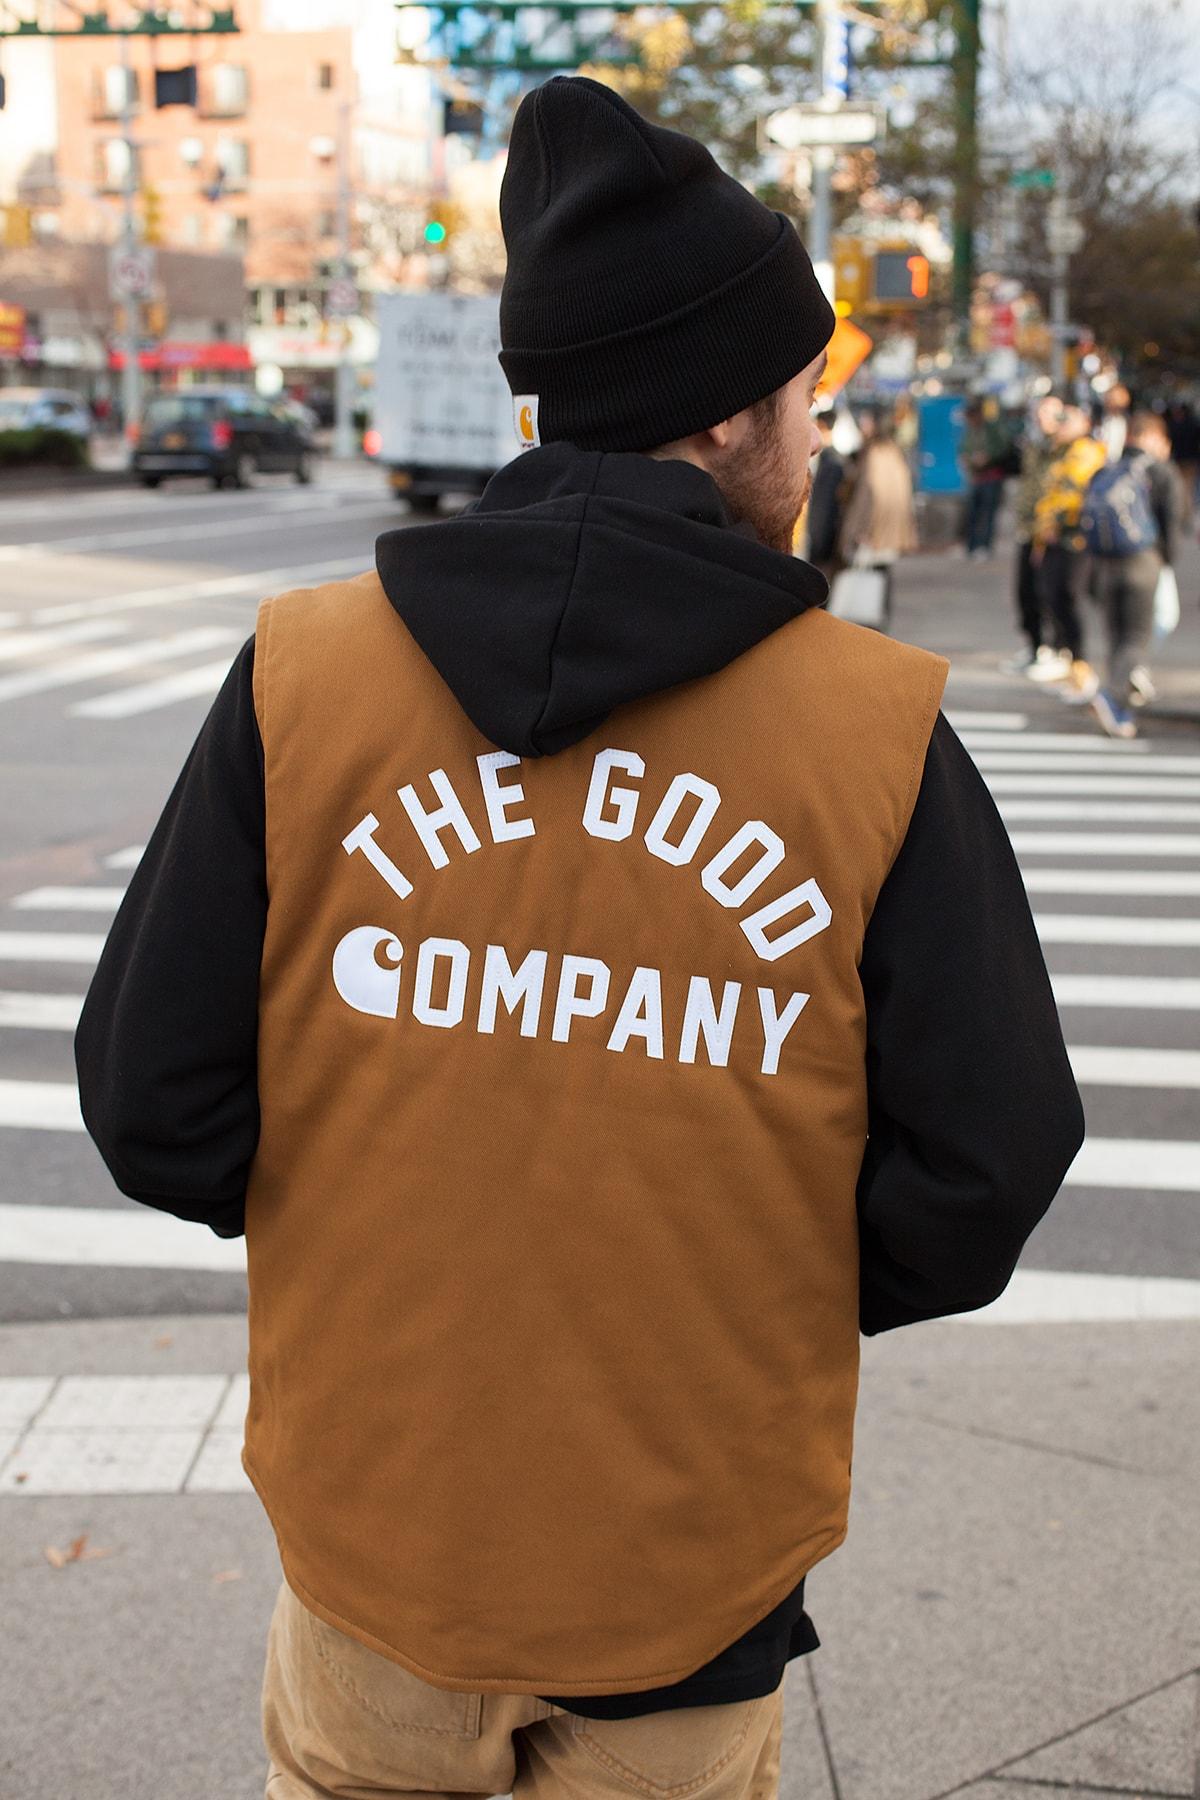 Carhartt WIP x The Good Company